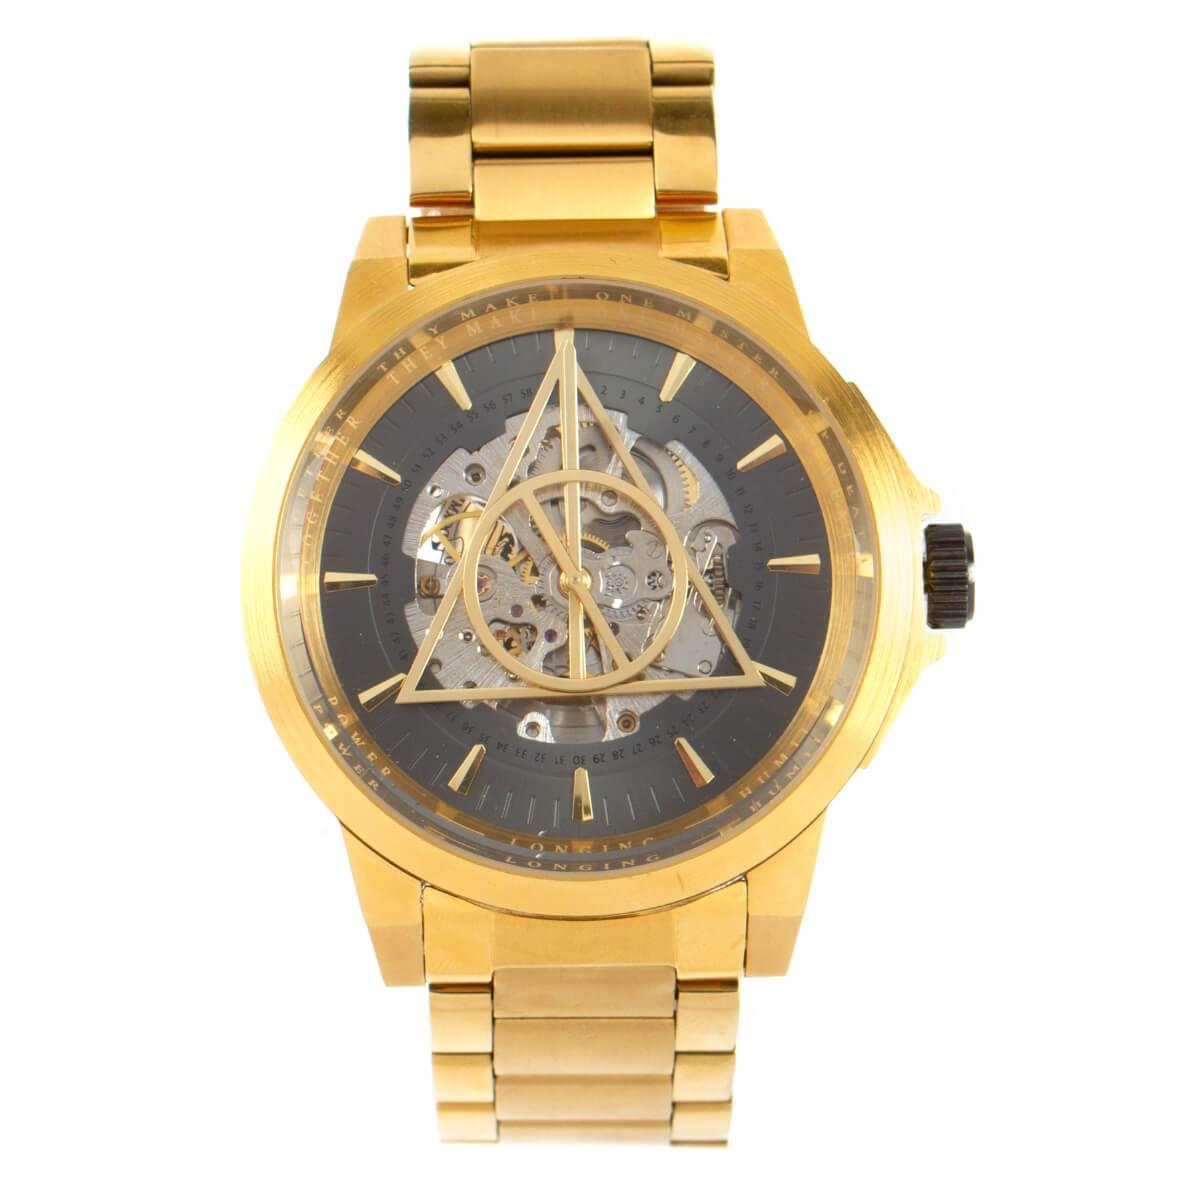 100f8948c1772 Relógio Harry Potter x Chilli Beans (185